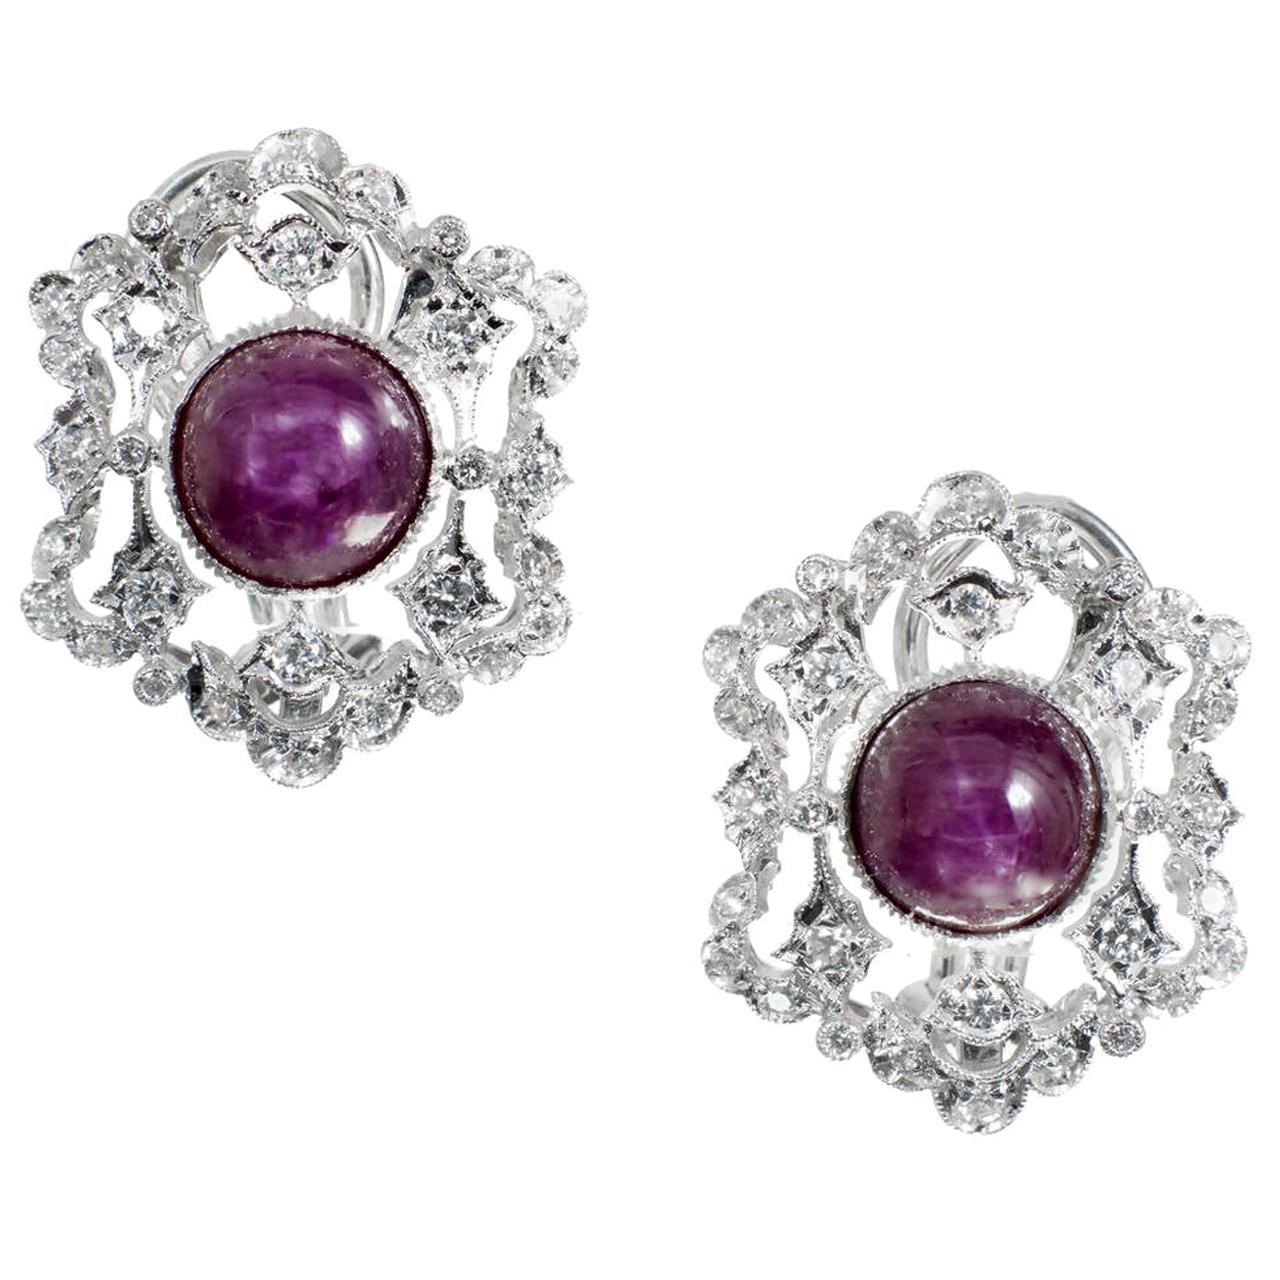 GIA Certified 5.00 Carat Ruby Diamond White Gold Earrings